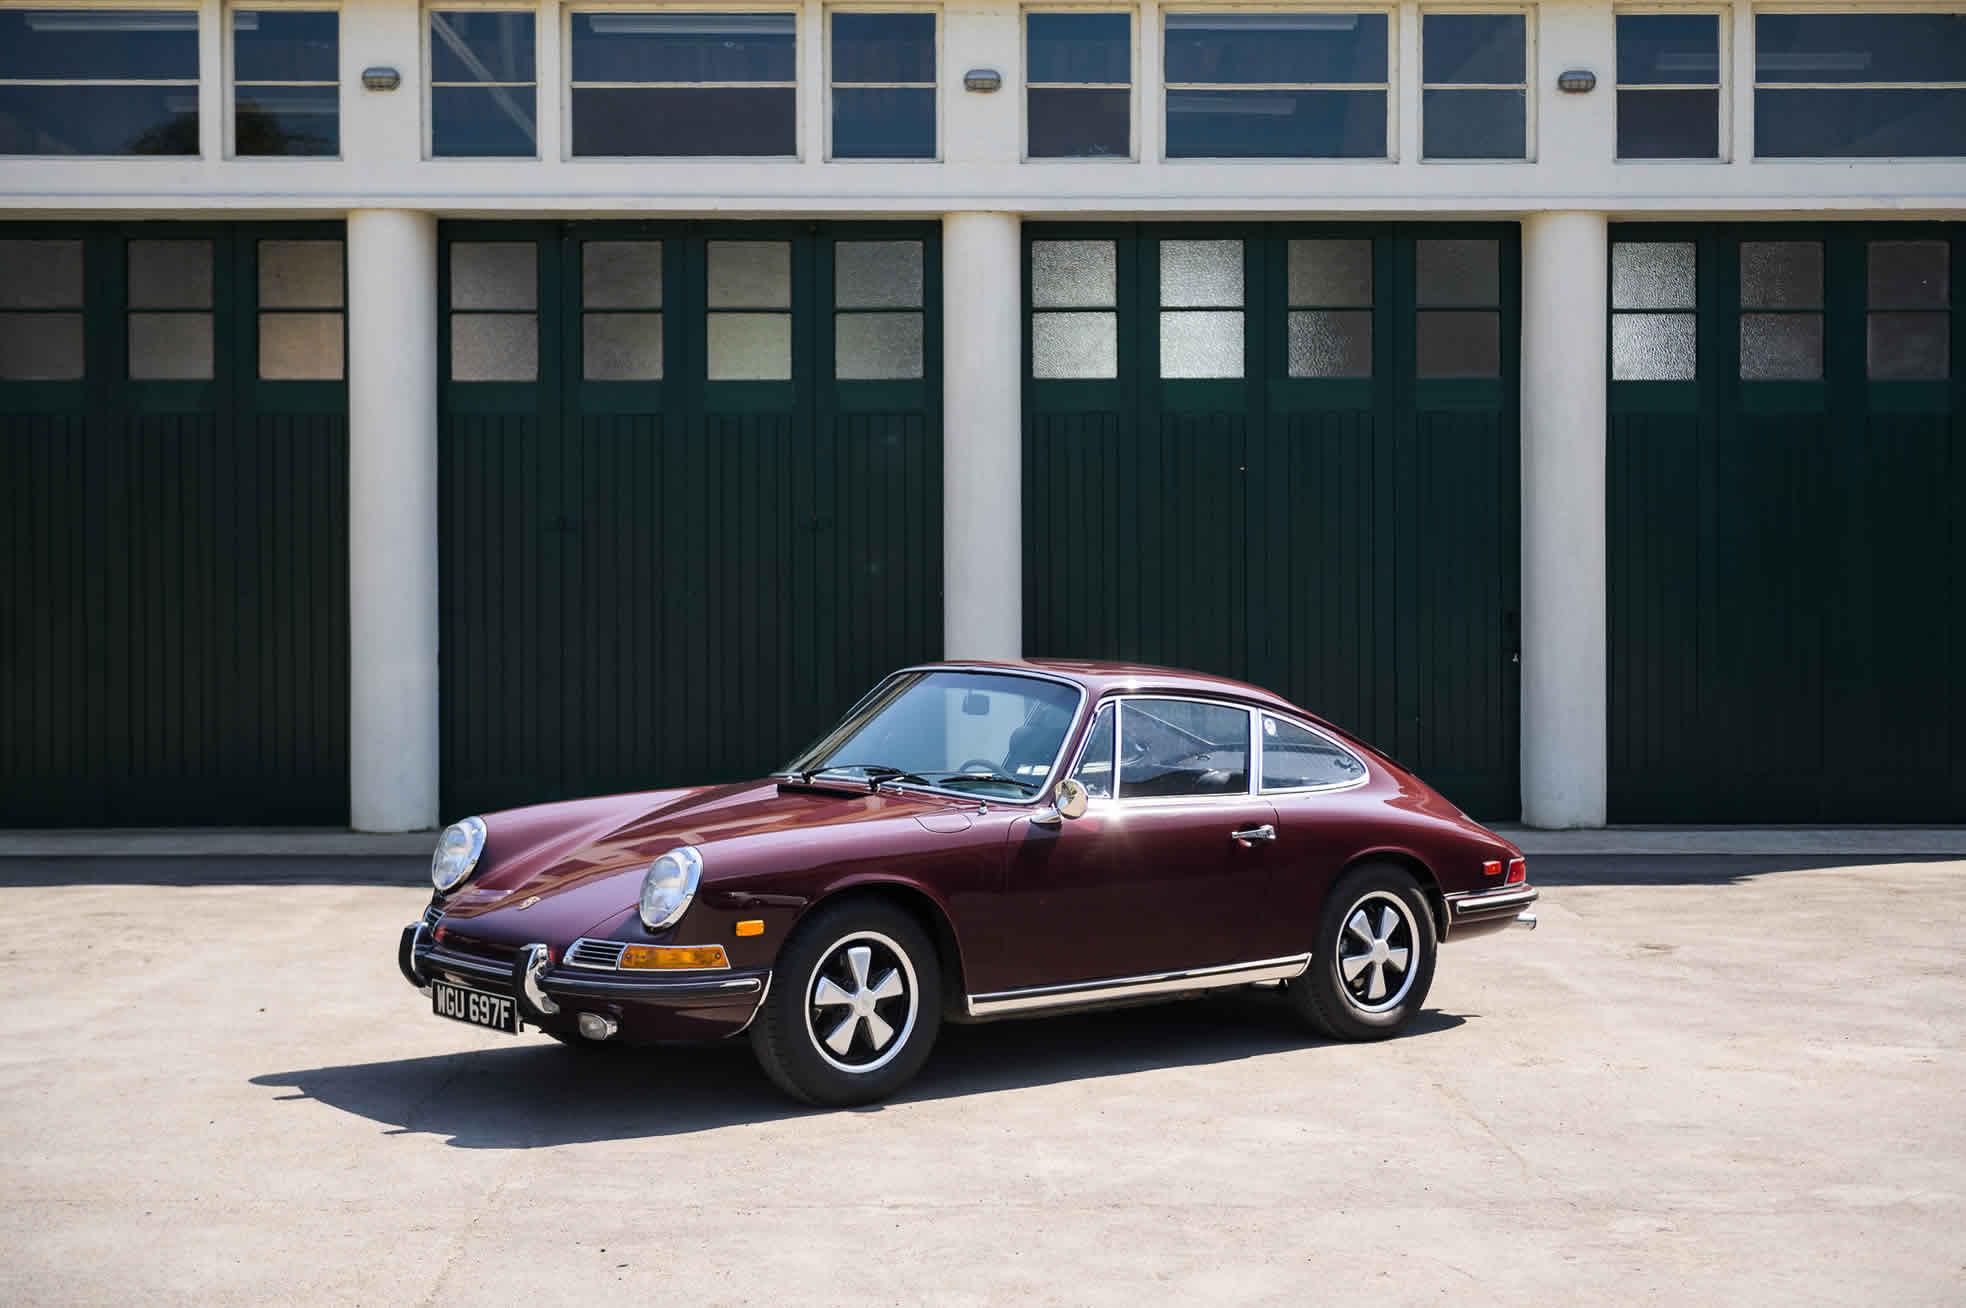 For Sale 1968 Porsche 911 L Sports Purpose Bicester Heritage detail